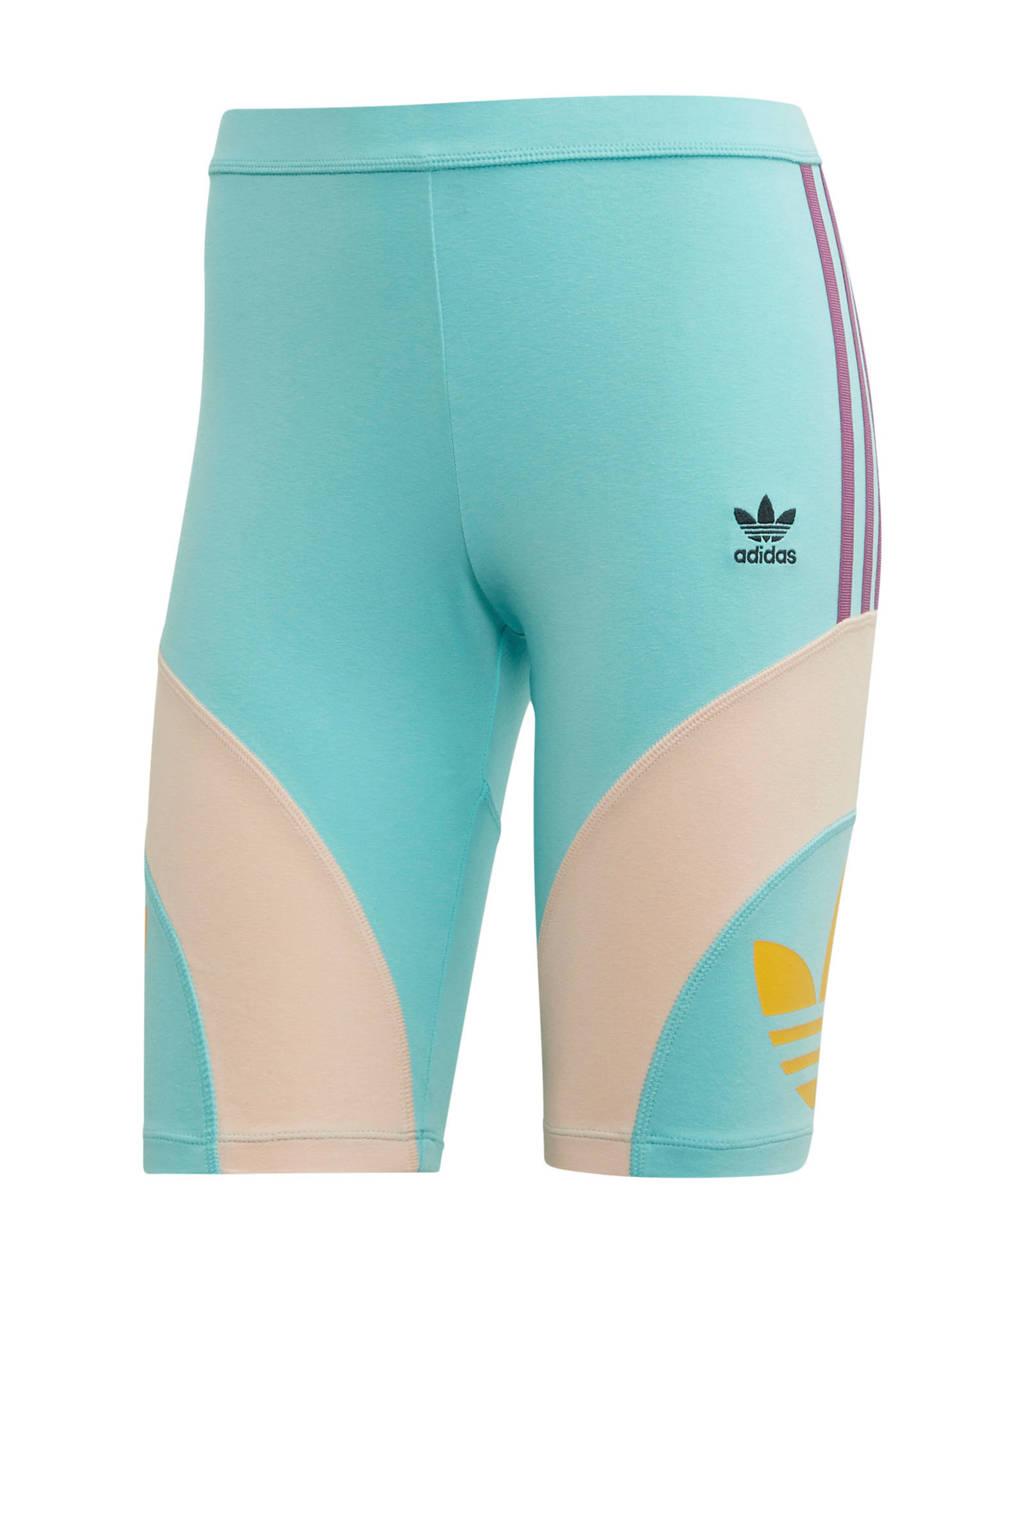 adidas originals cycling short blauw, Lichtblauw/roze